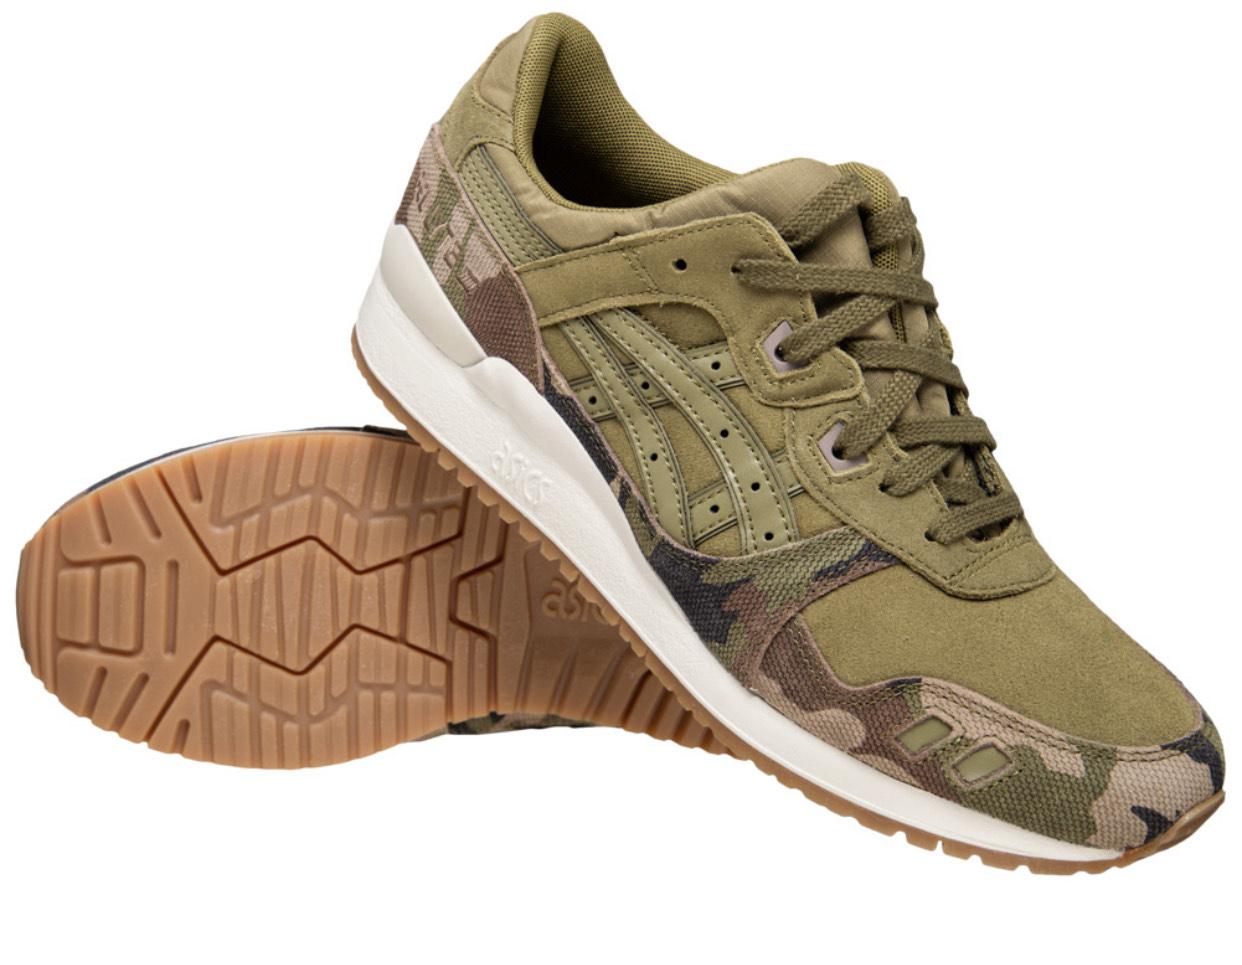 ASICS Tiger GEL-Lyte III Sneaker Oliv